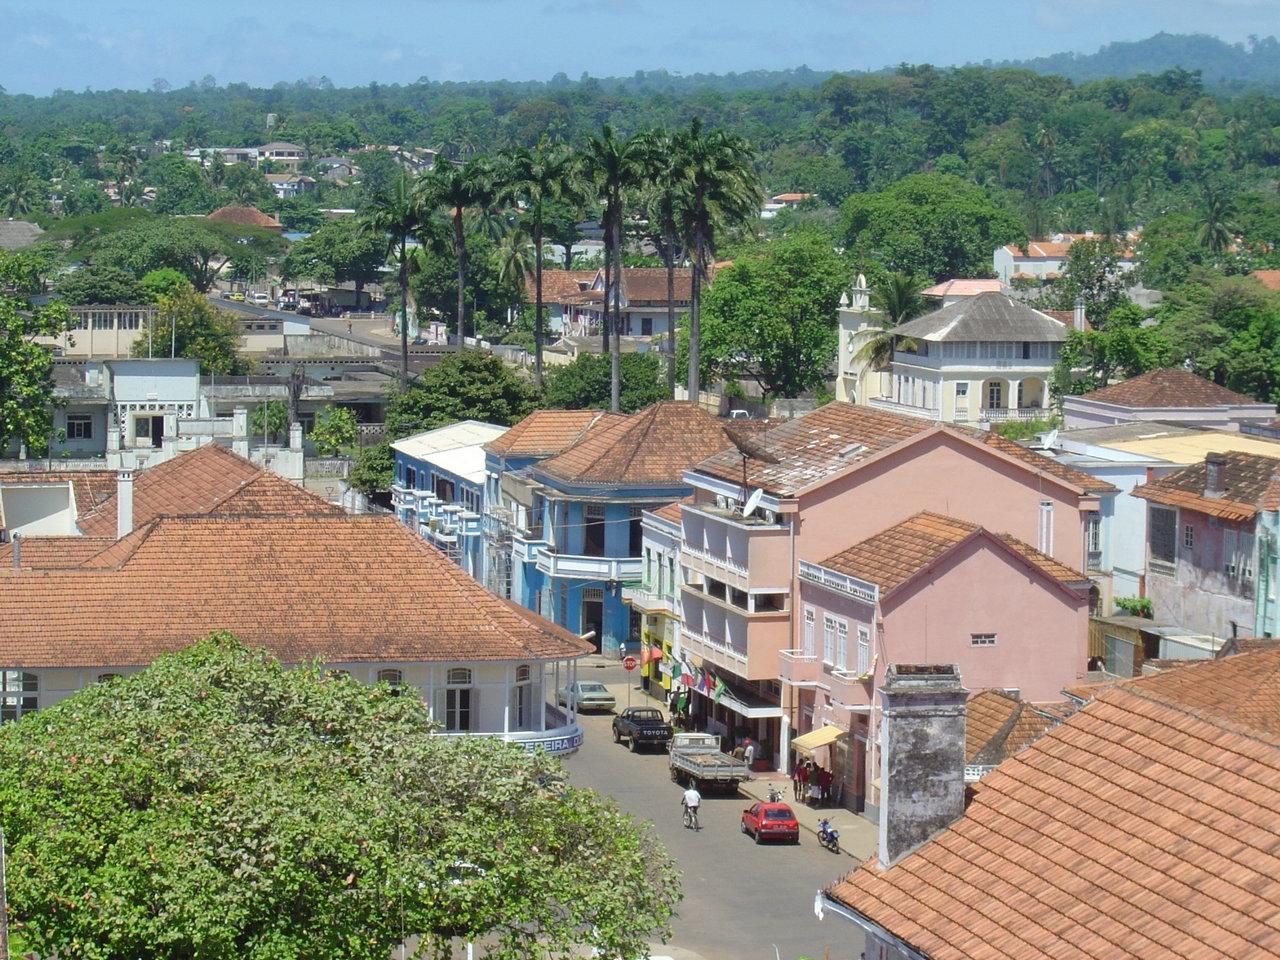 Особенности и достопримечательности Сан-Томе и Принсипи